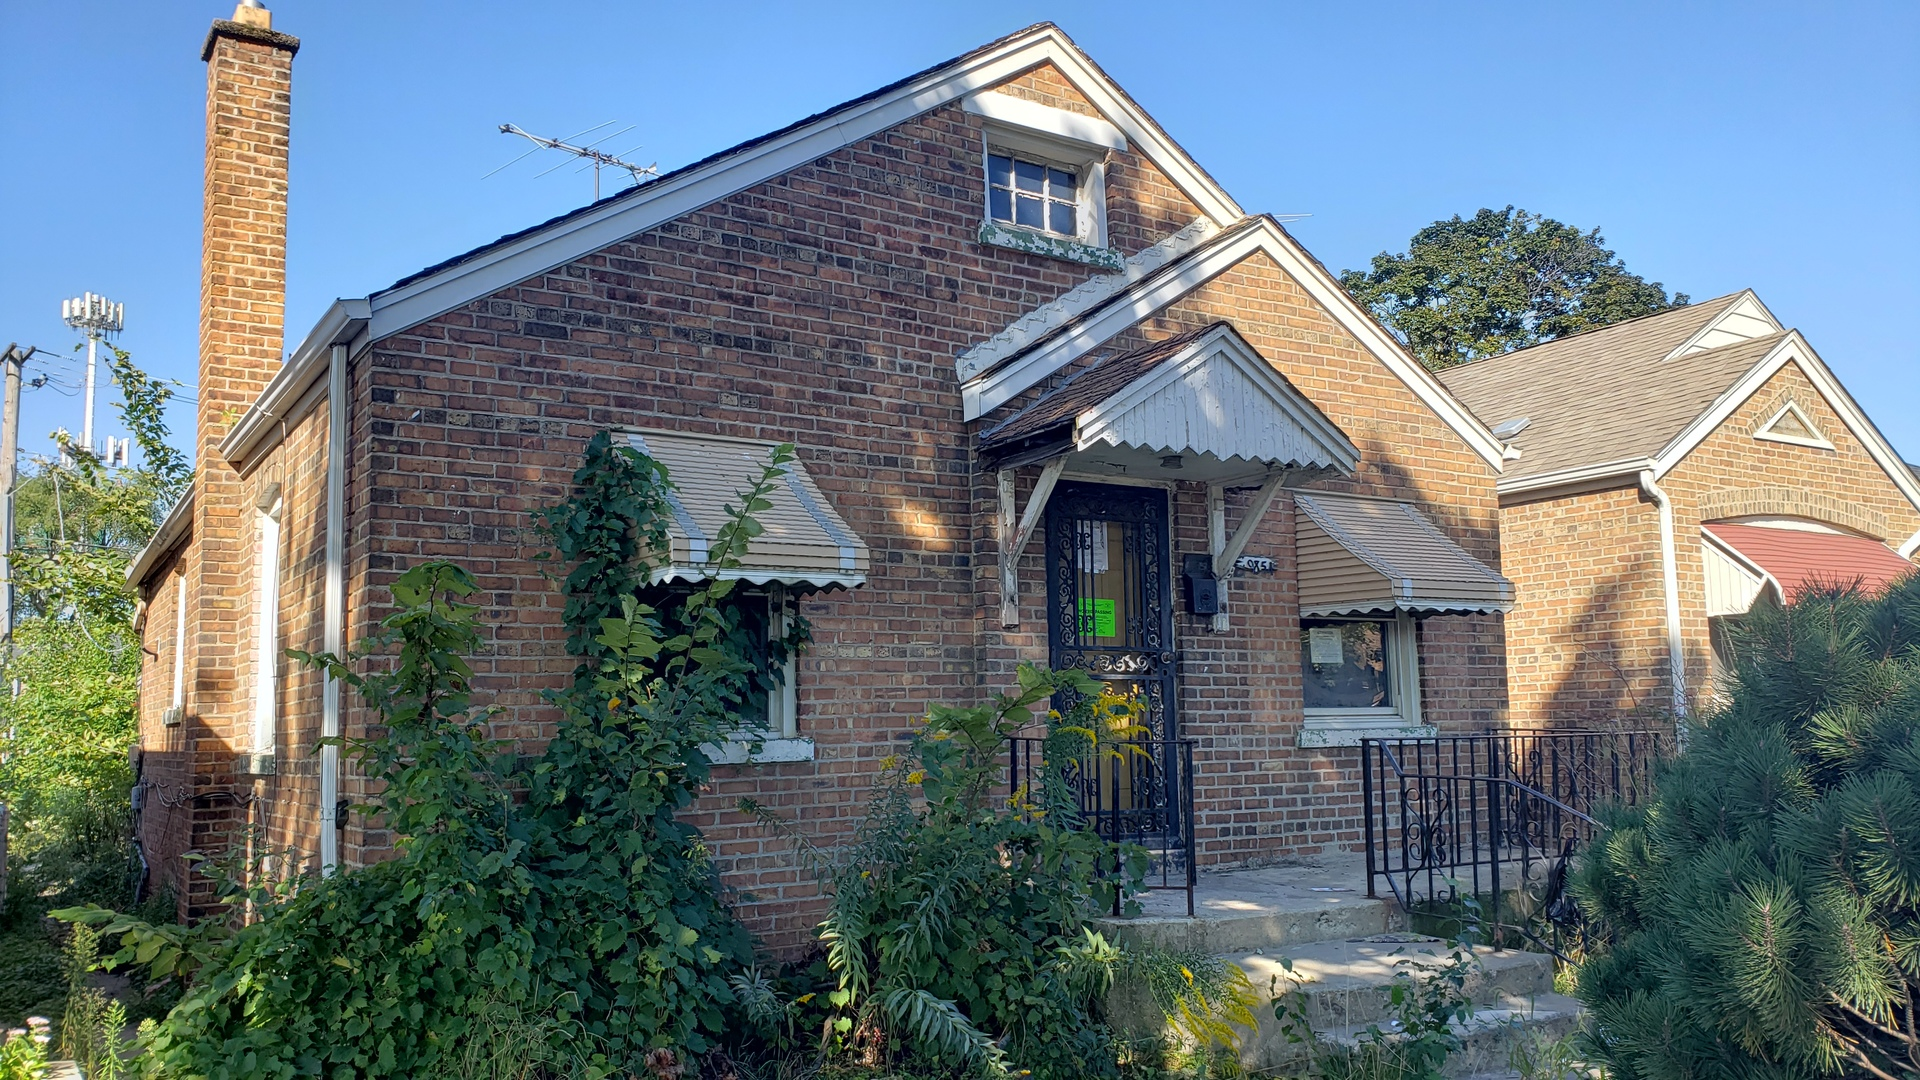 9854 S Maryland Exterior Photo